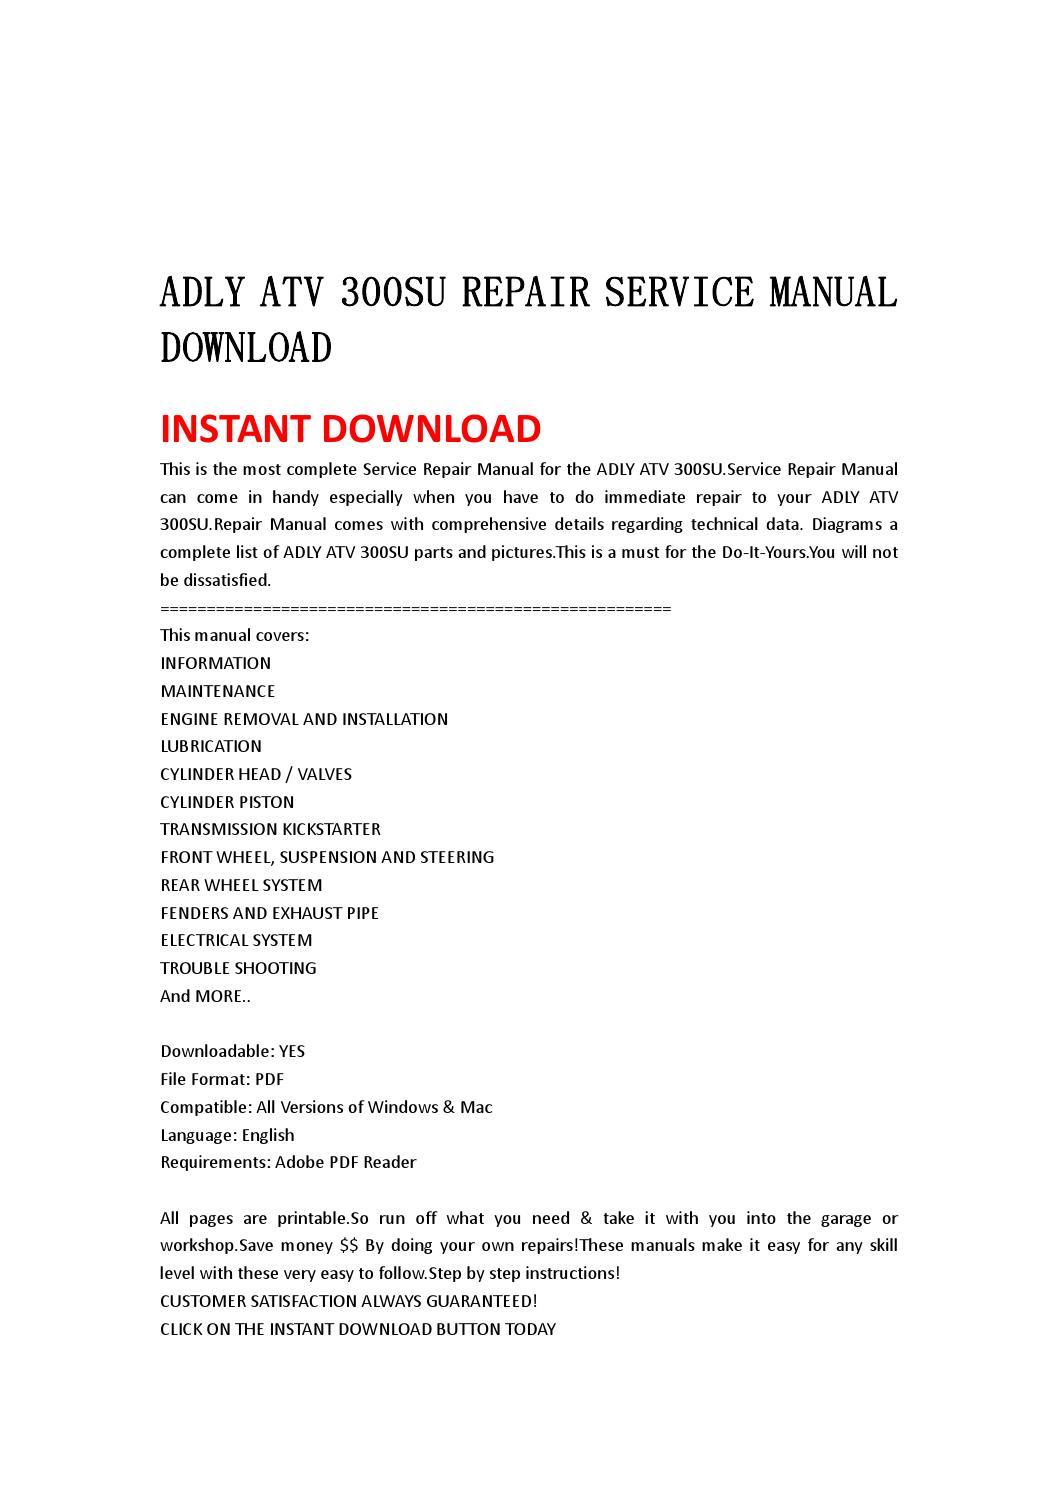 Adly atv 300su repair service manual download by jjhfnnsnen - issuu